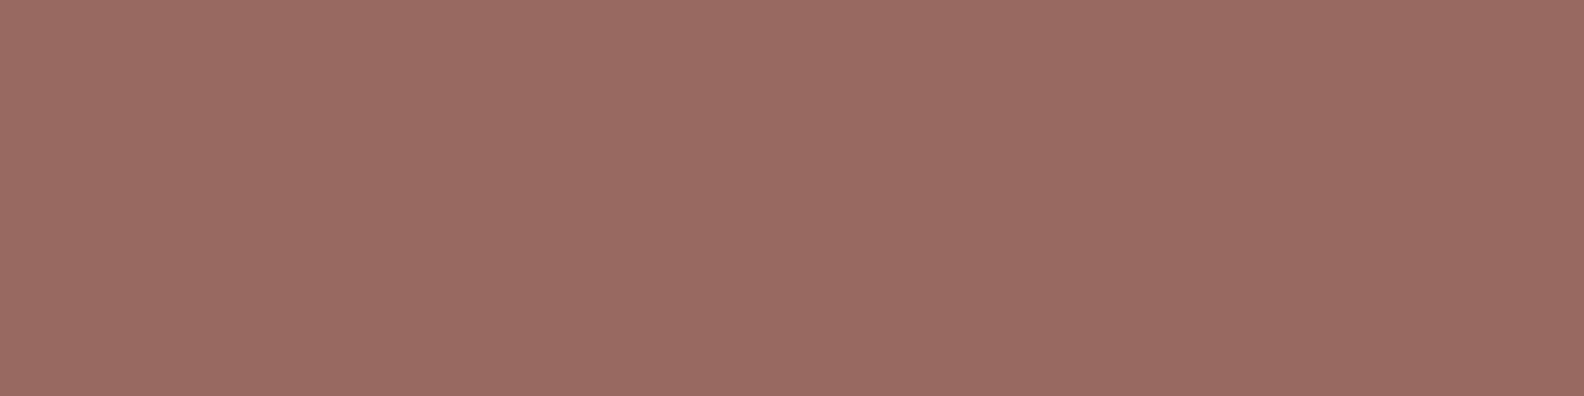 1584x396 Dark Chestnut Solid Color Background